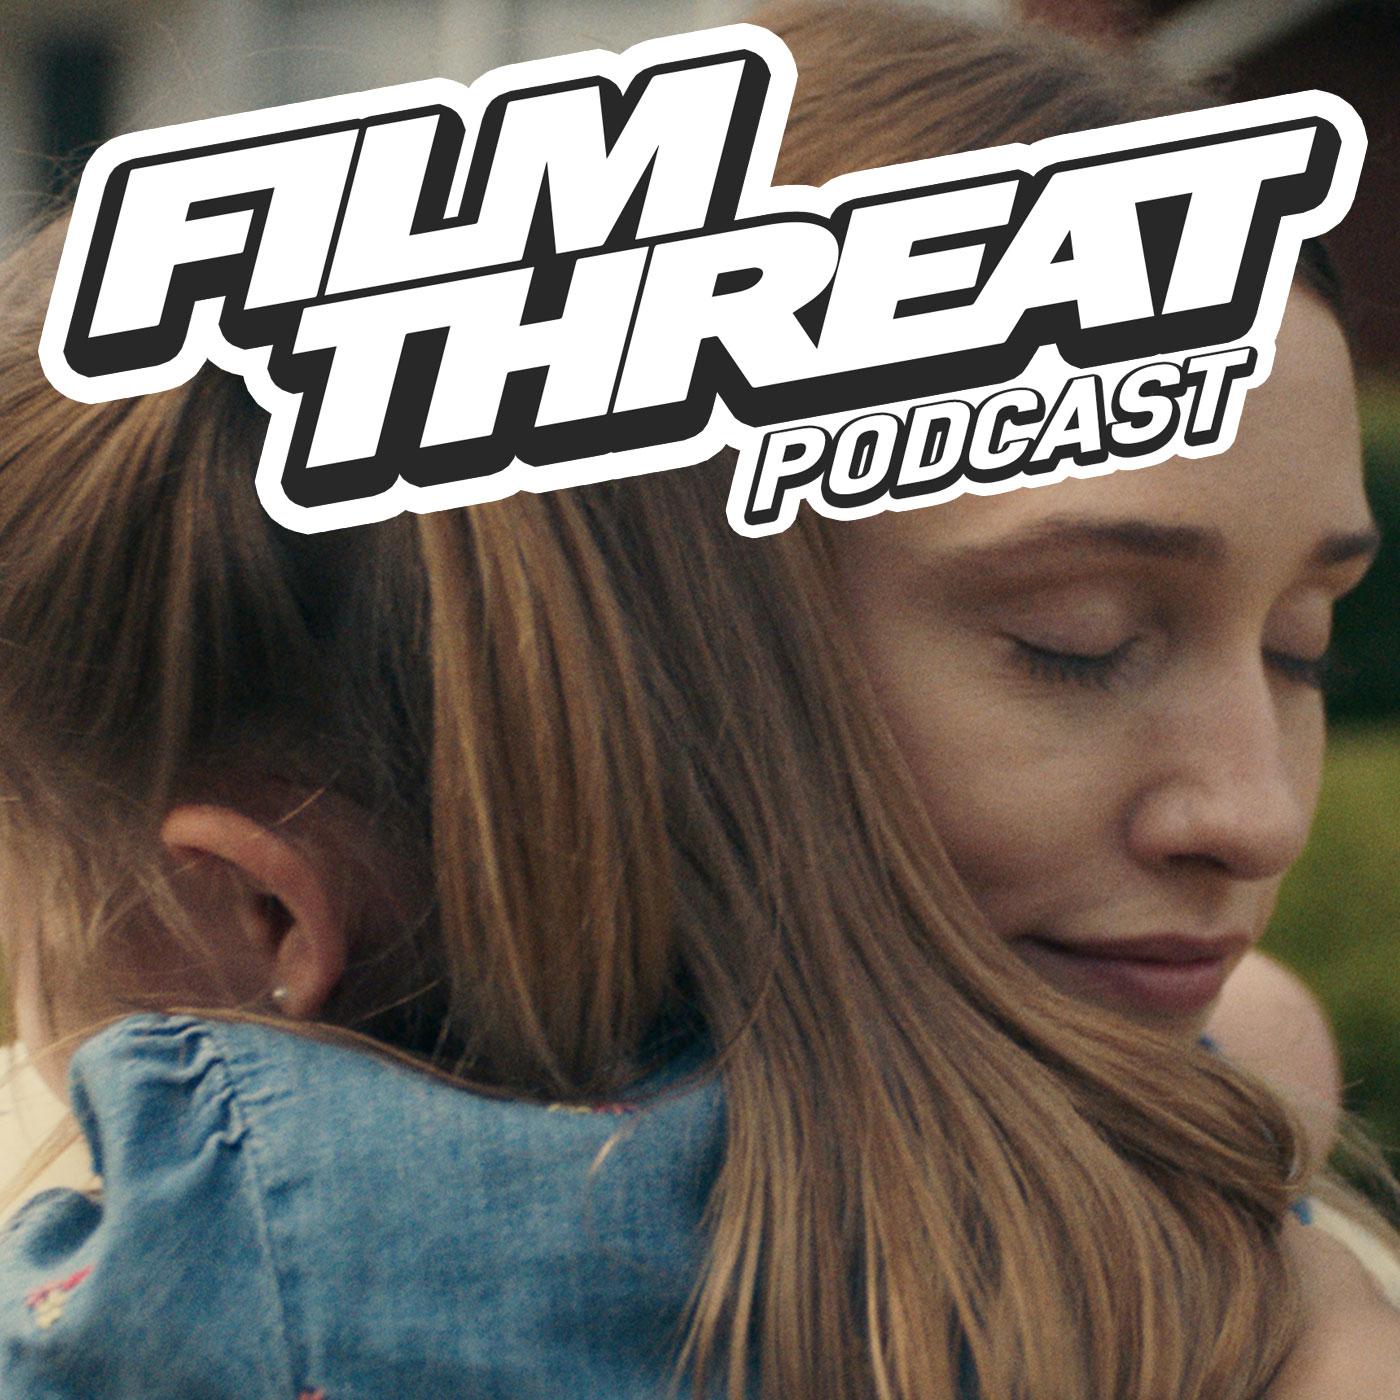 Podcast episode image